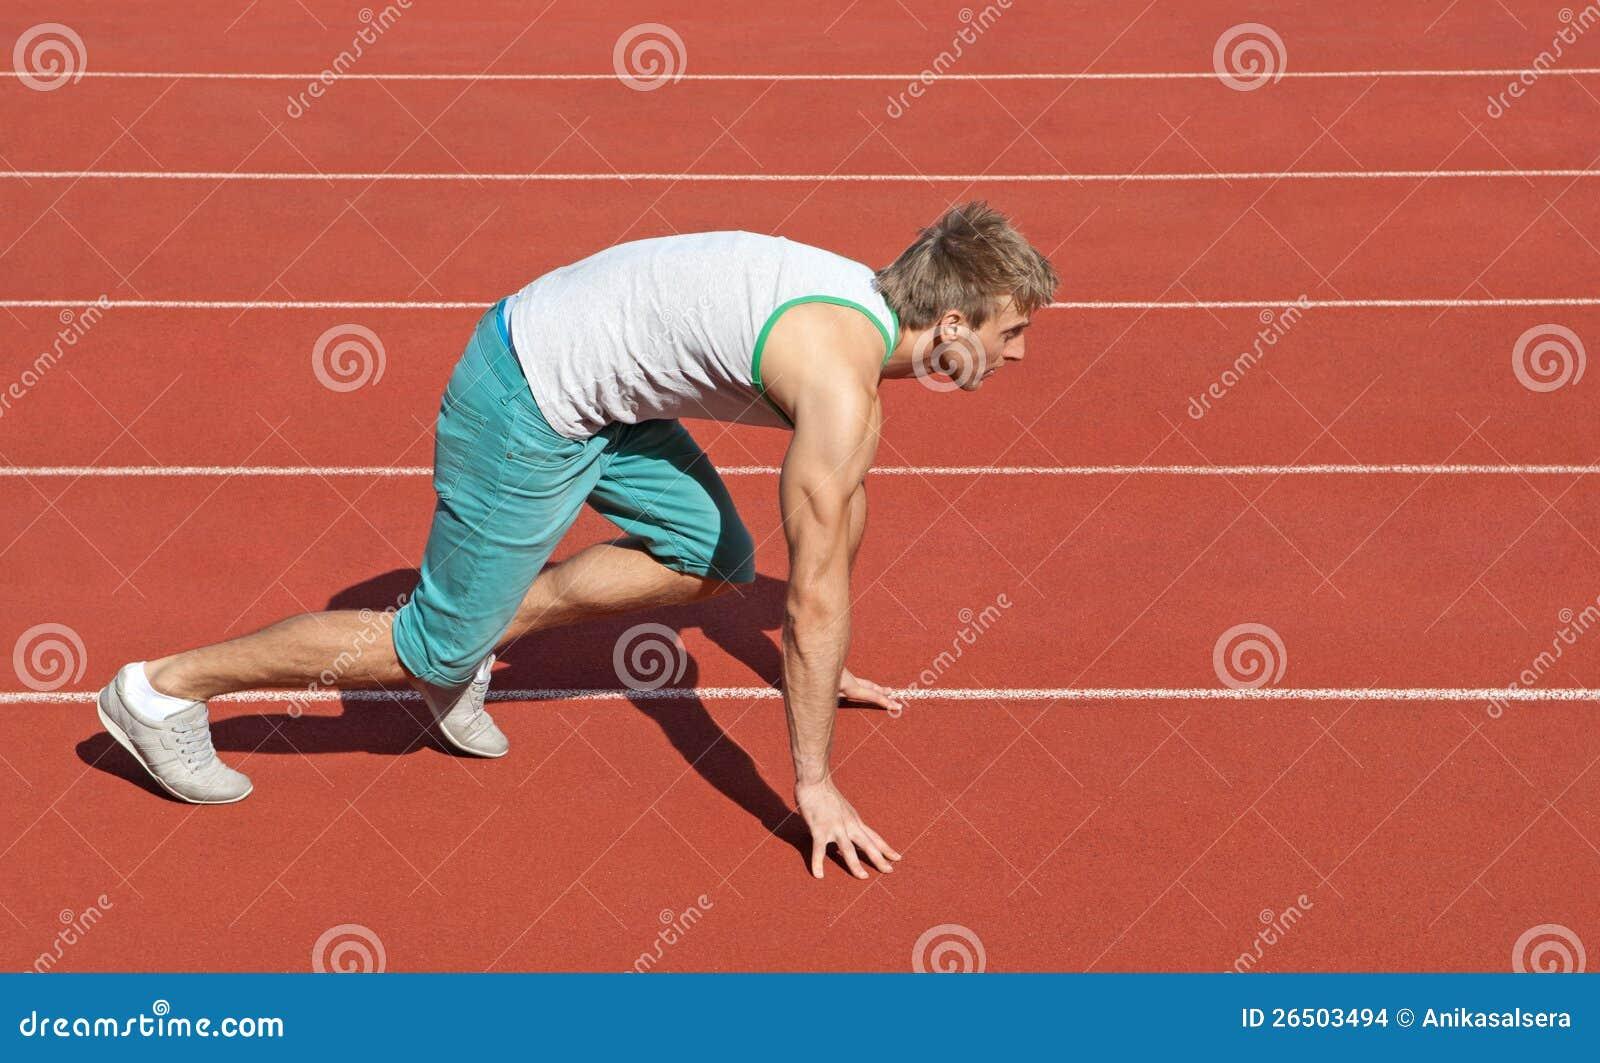 Young man preparing to run